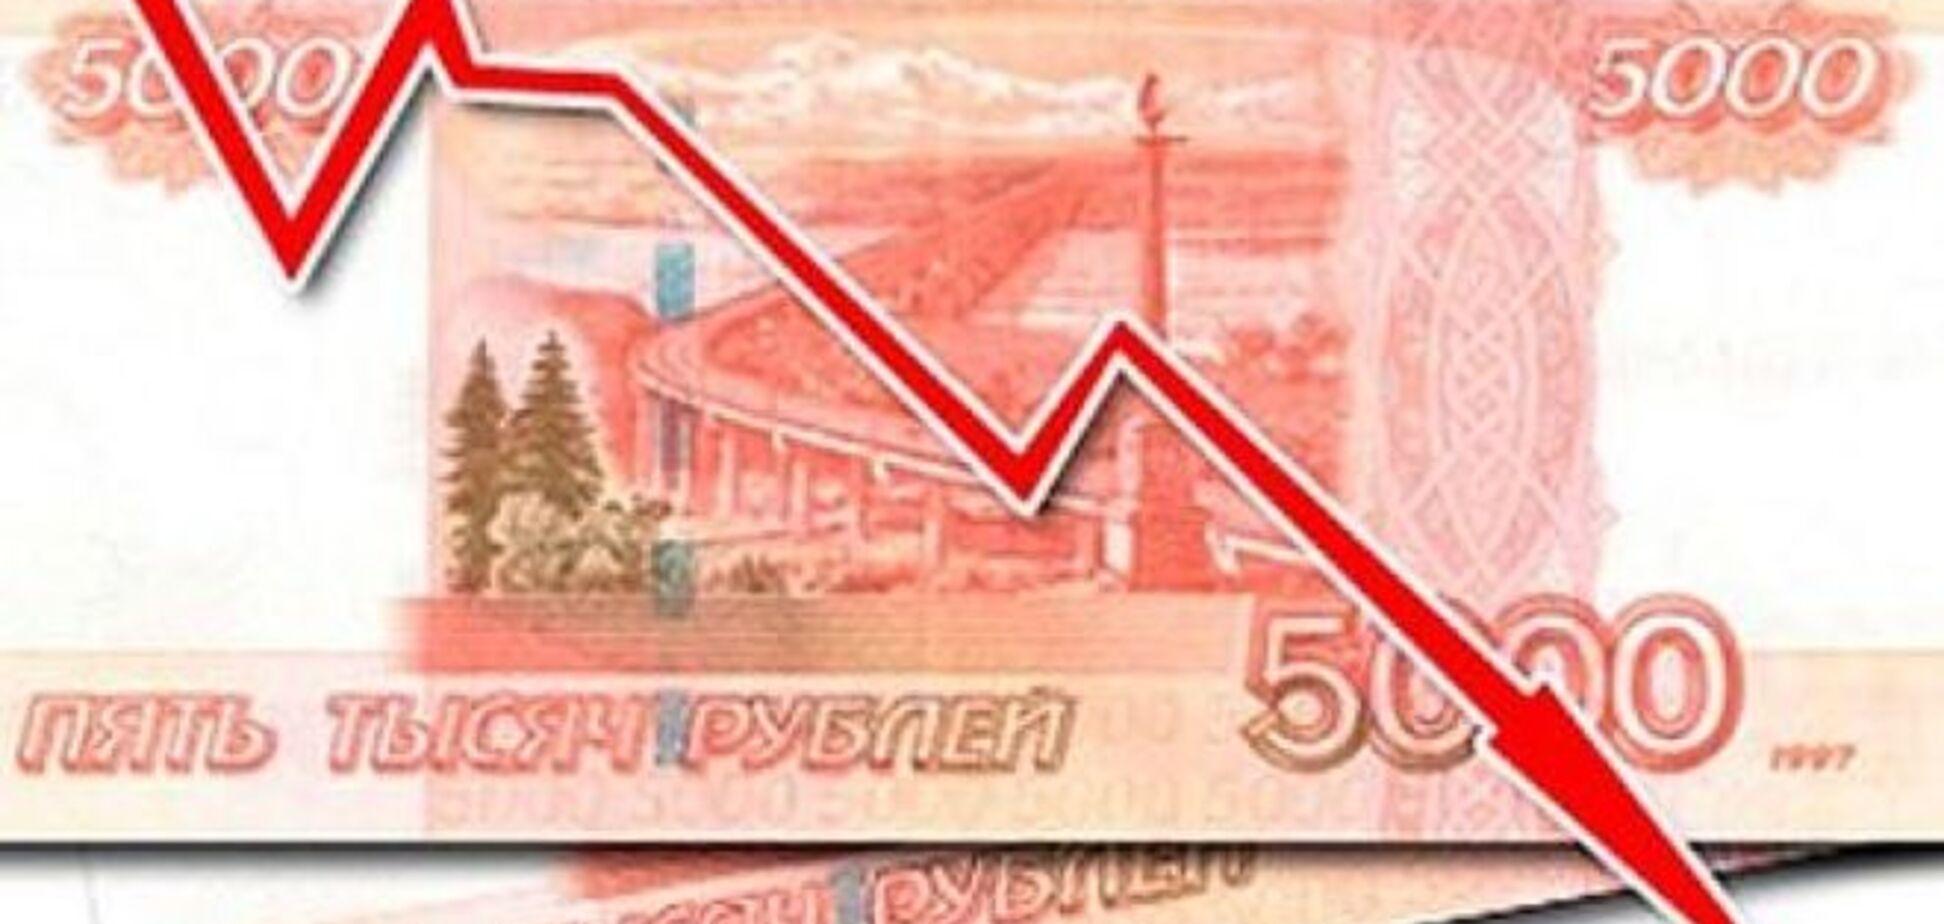 Обвал рубля в Росії: експерт назвав фатальну помилку Кремля